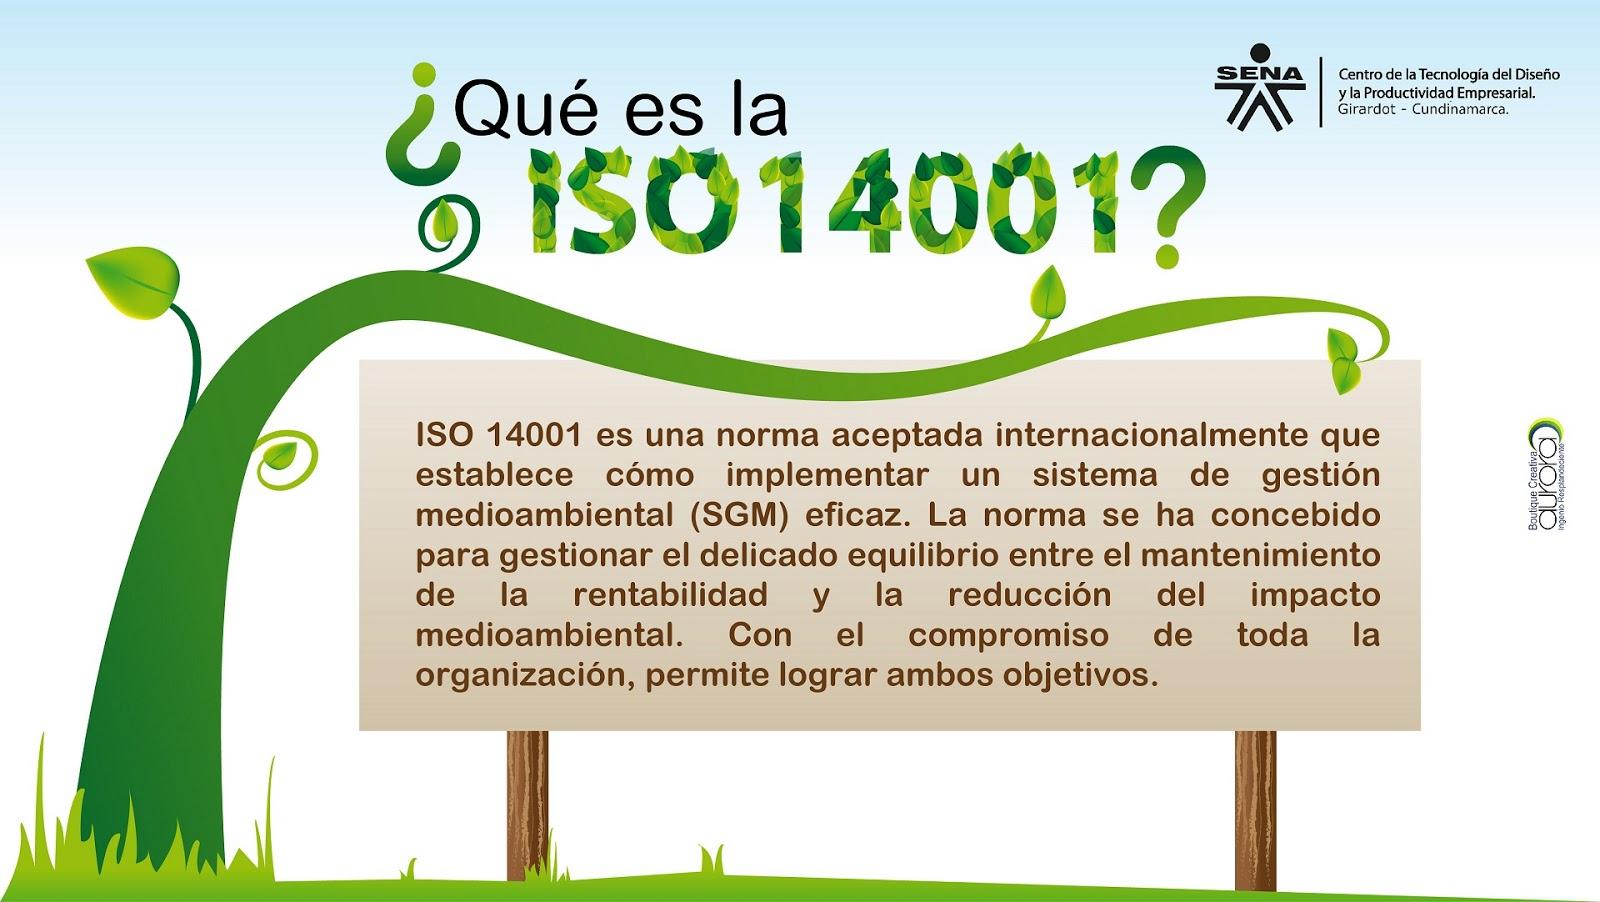 iso 14001 version 2004 pdf